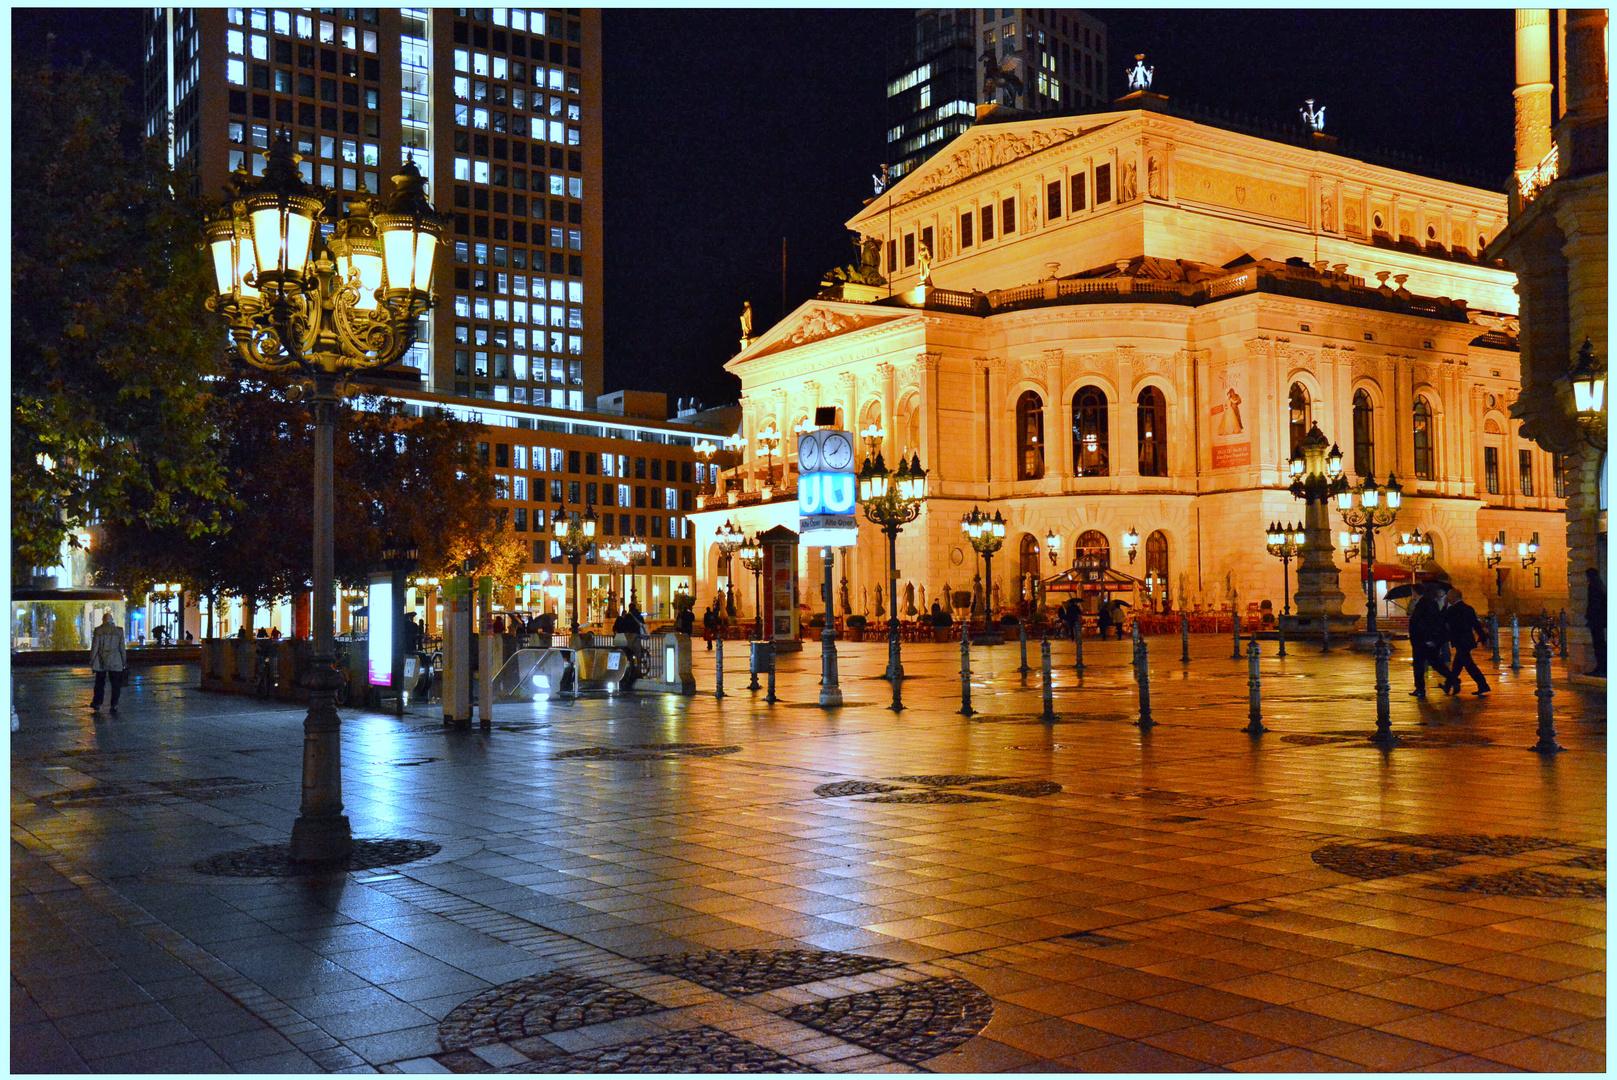 Frankfurt, la ópera por la noche (die Oper nachts)